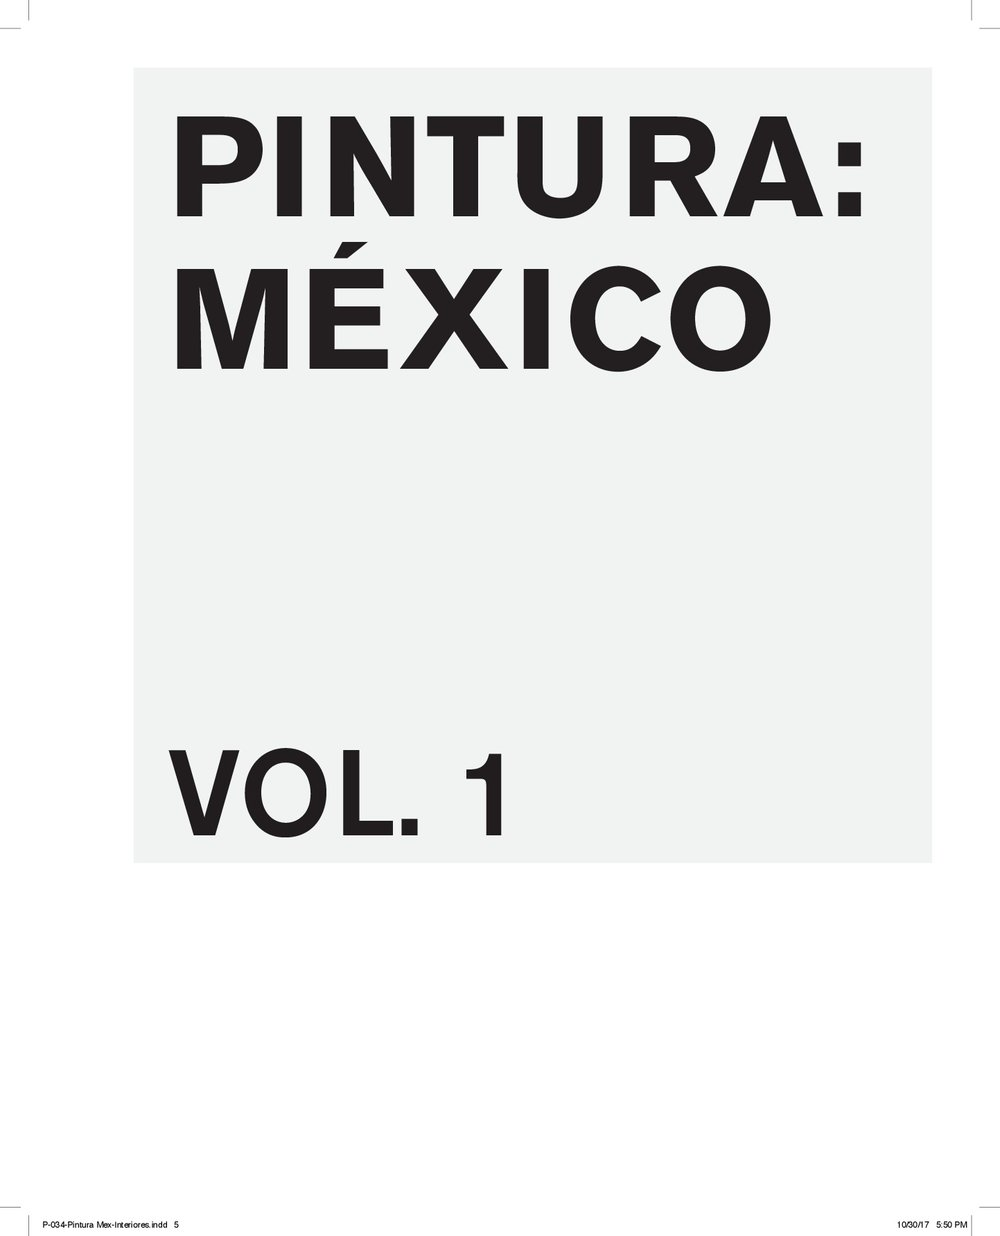 P-034-Pintura-Mex-Interiores-L04-3-005.jpg